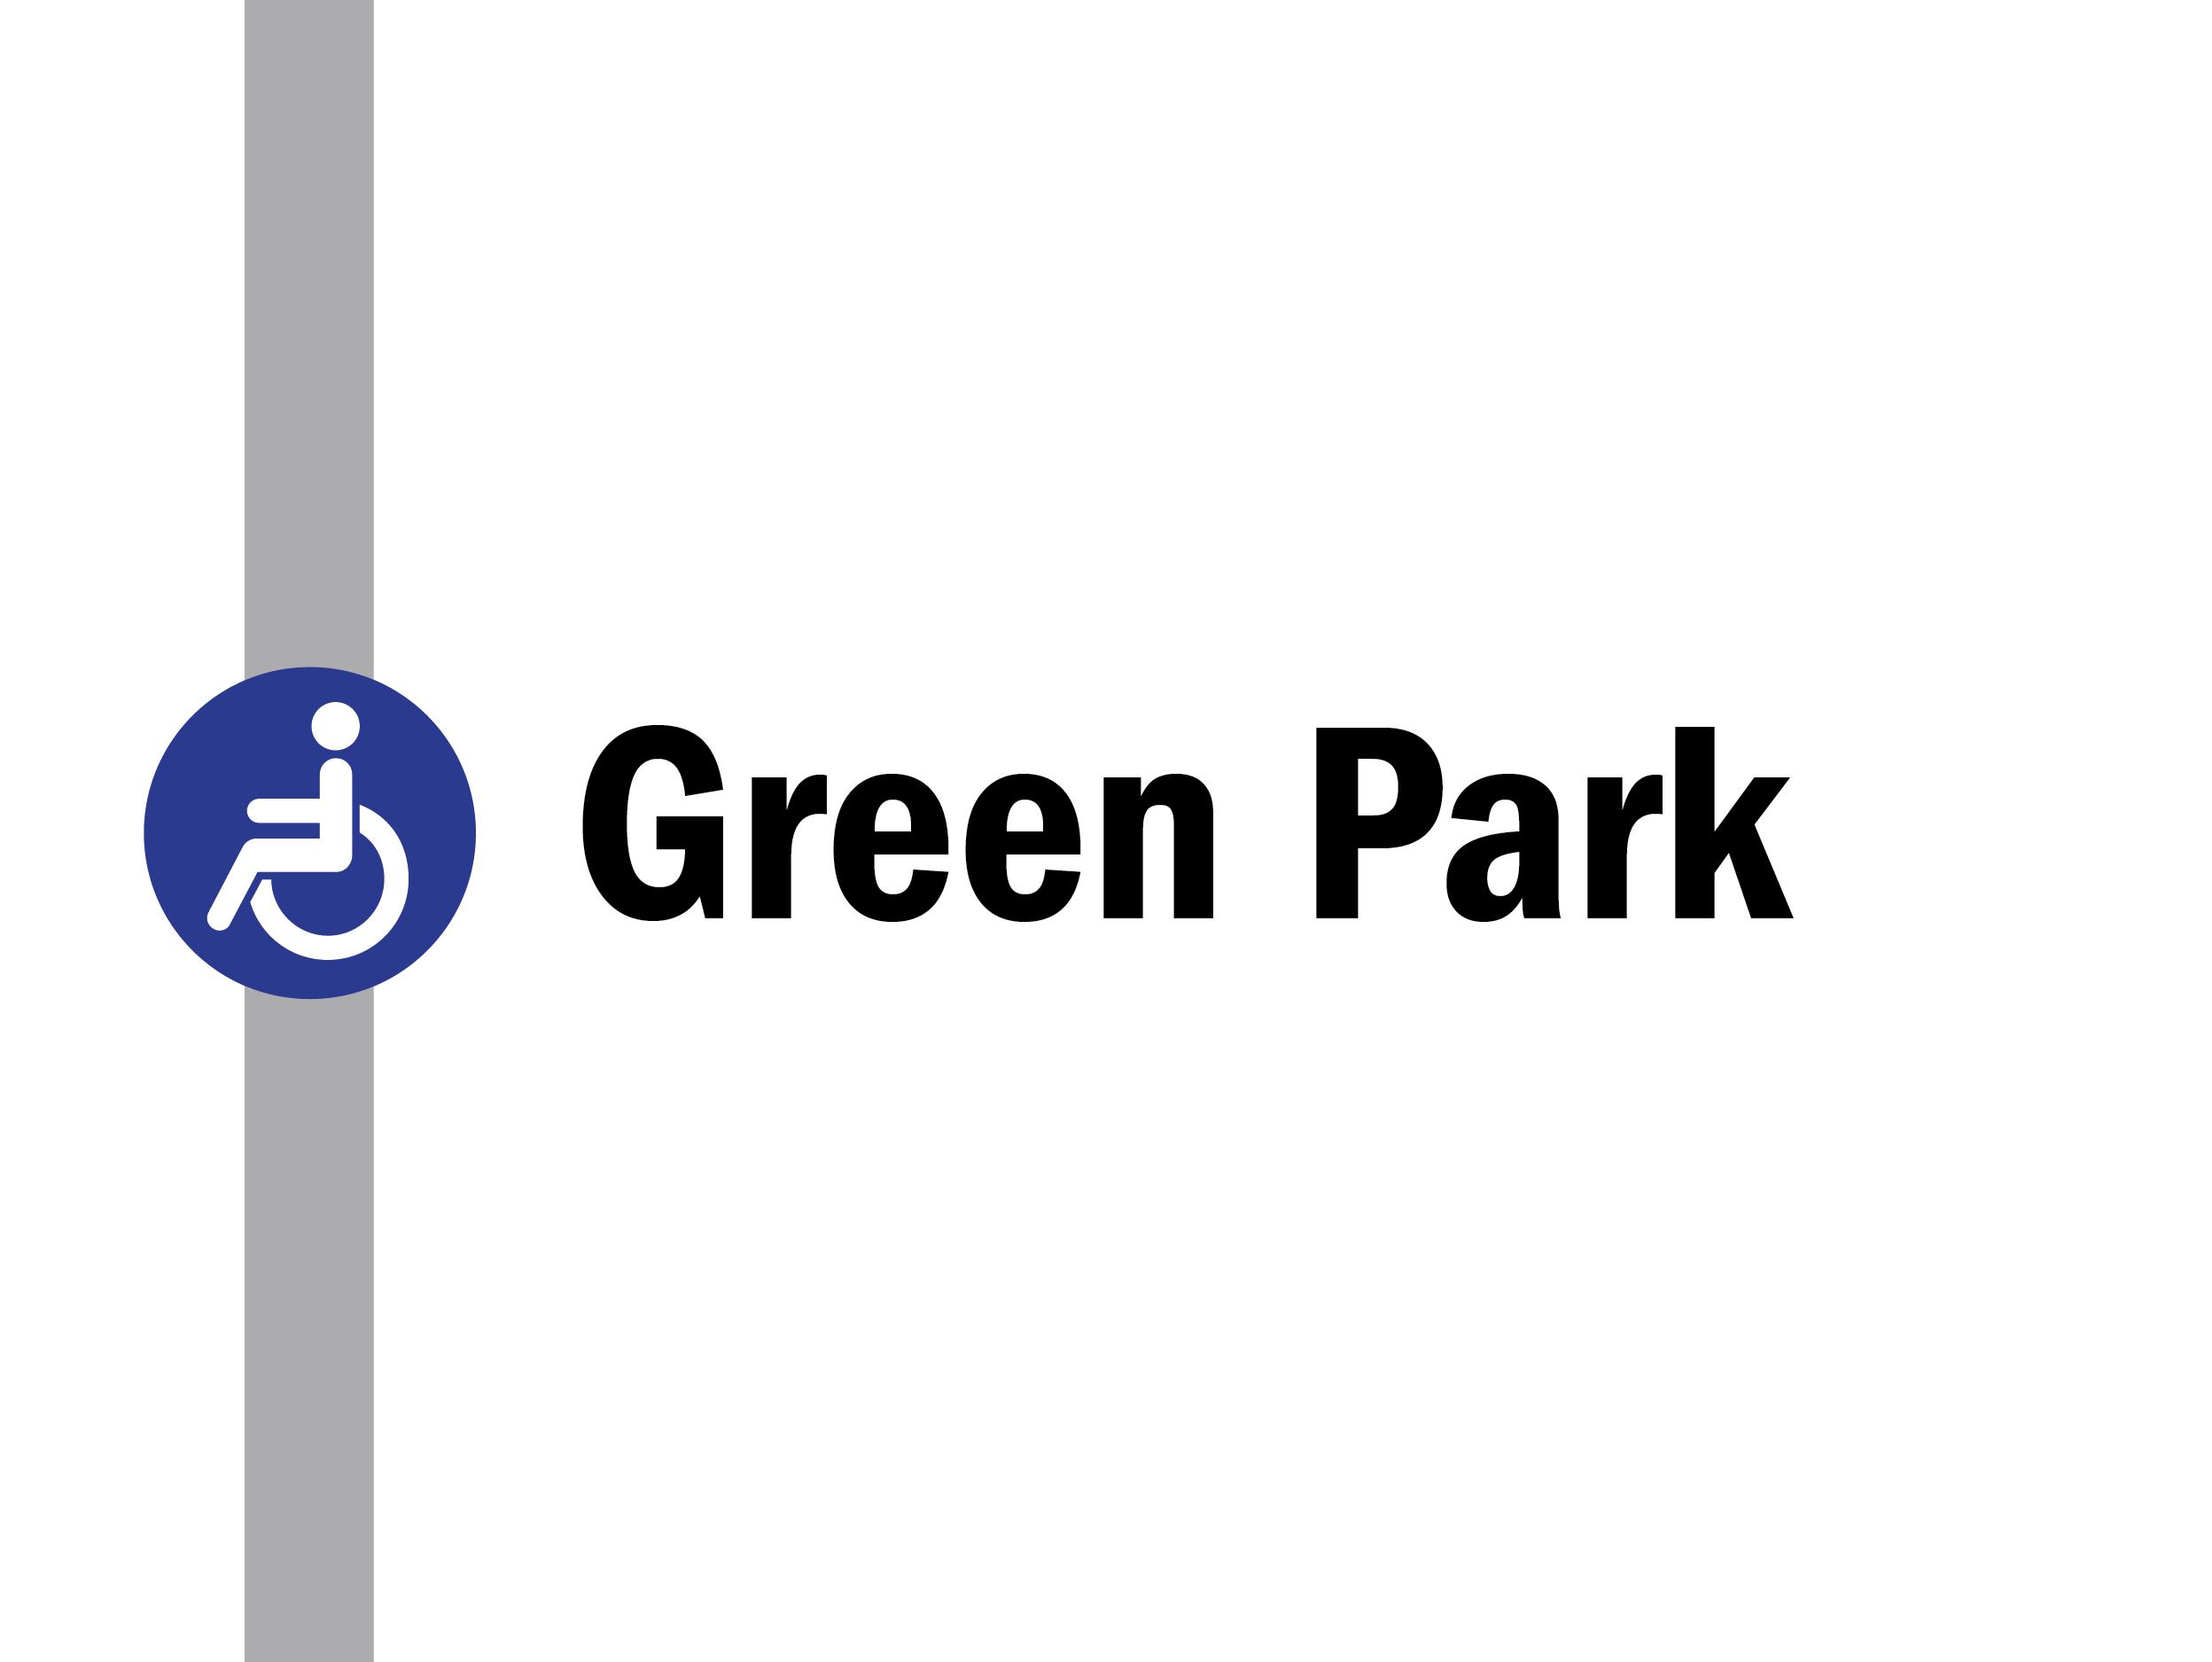 Green Park, night tube